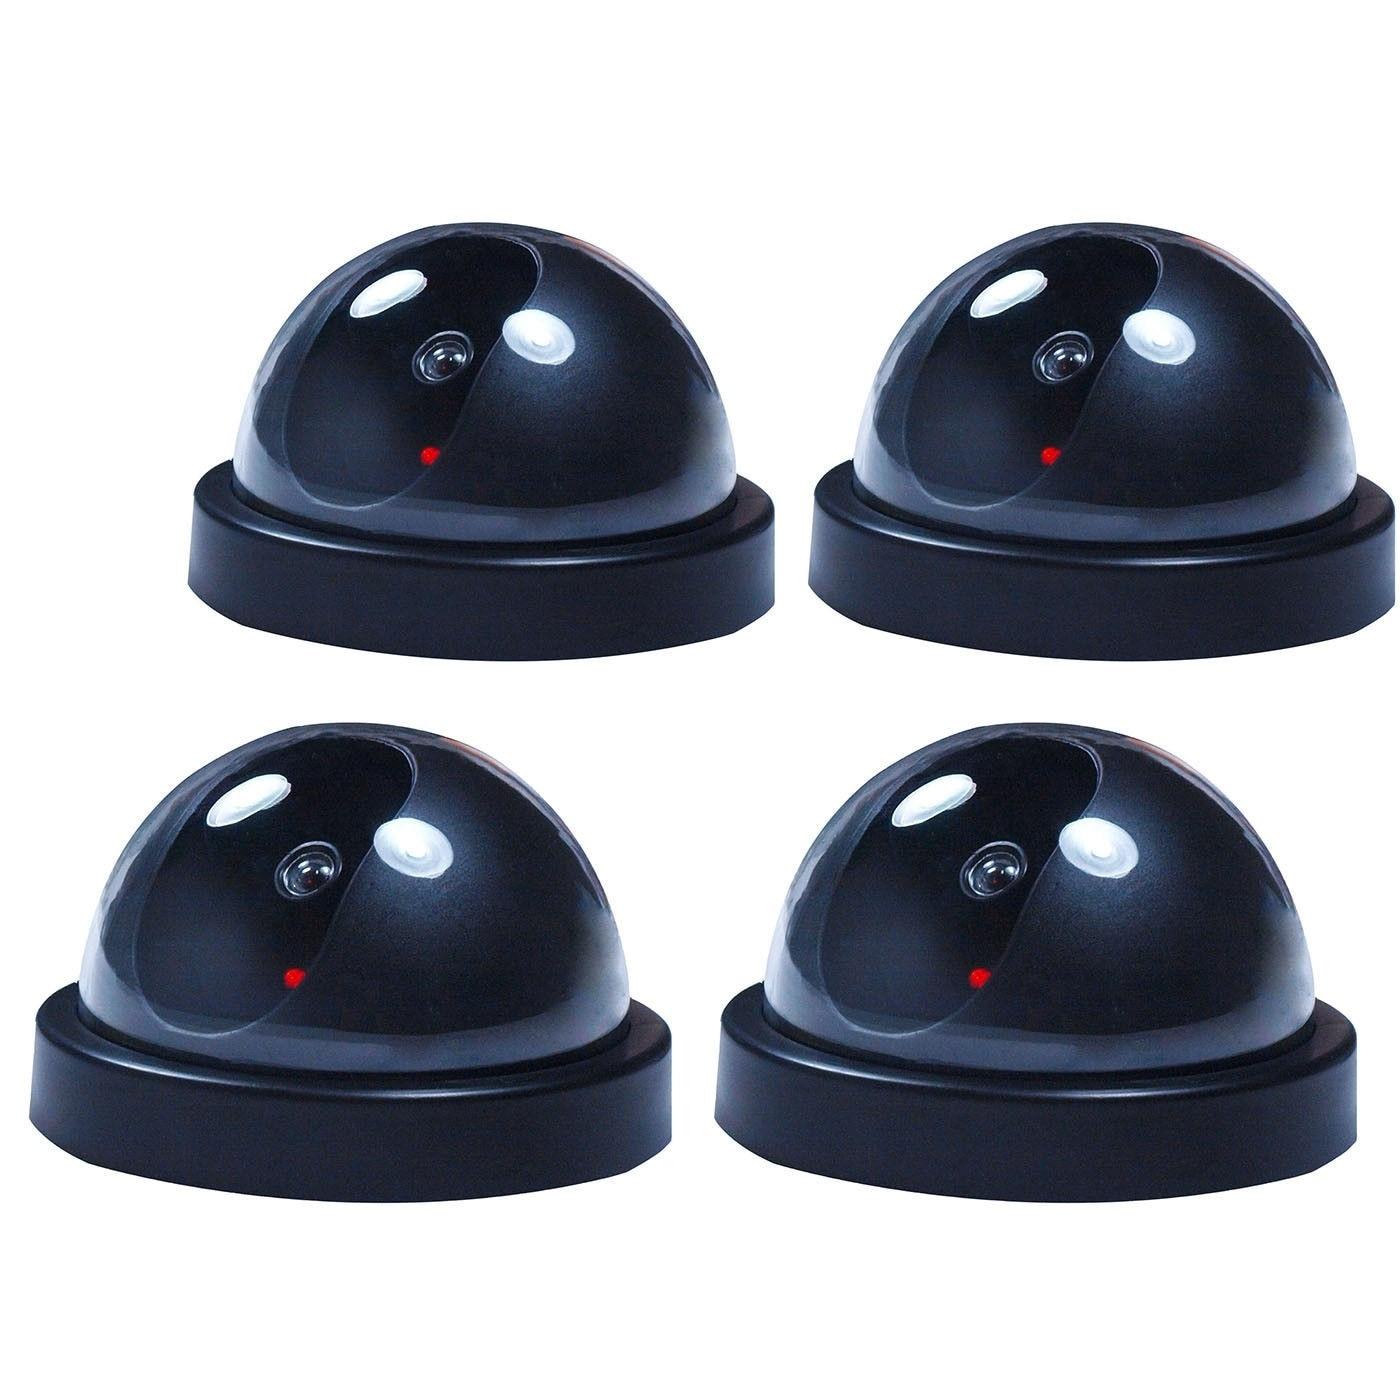 4 PCs Fake Dummy Dome Surveillance Security Camera CCTV w/ Record Flash Light